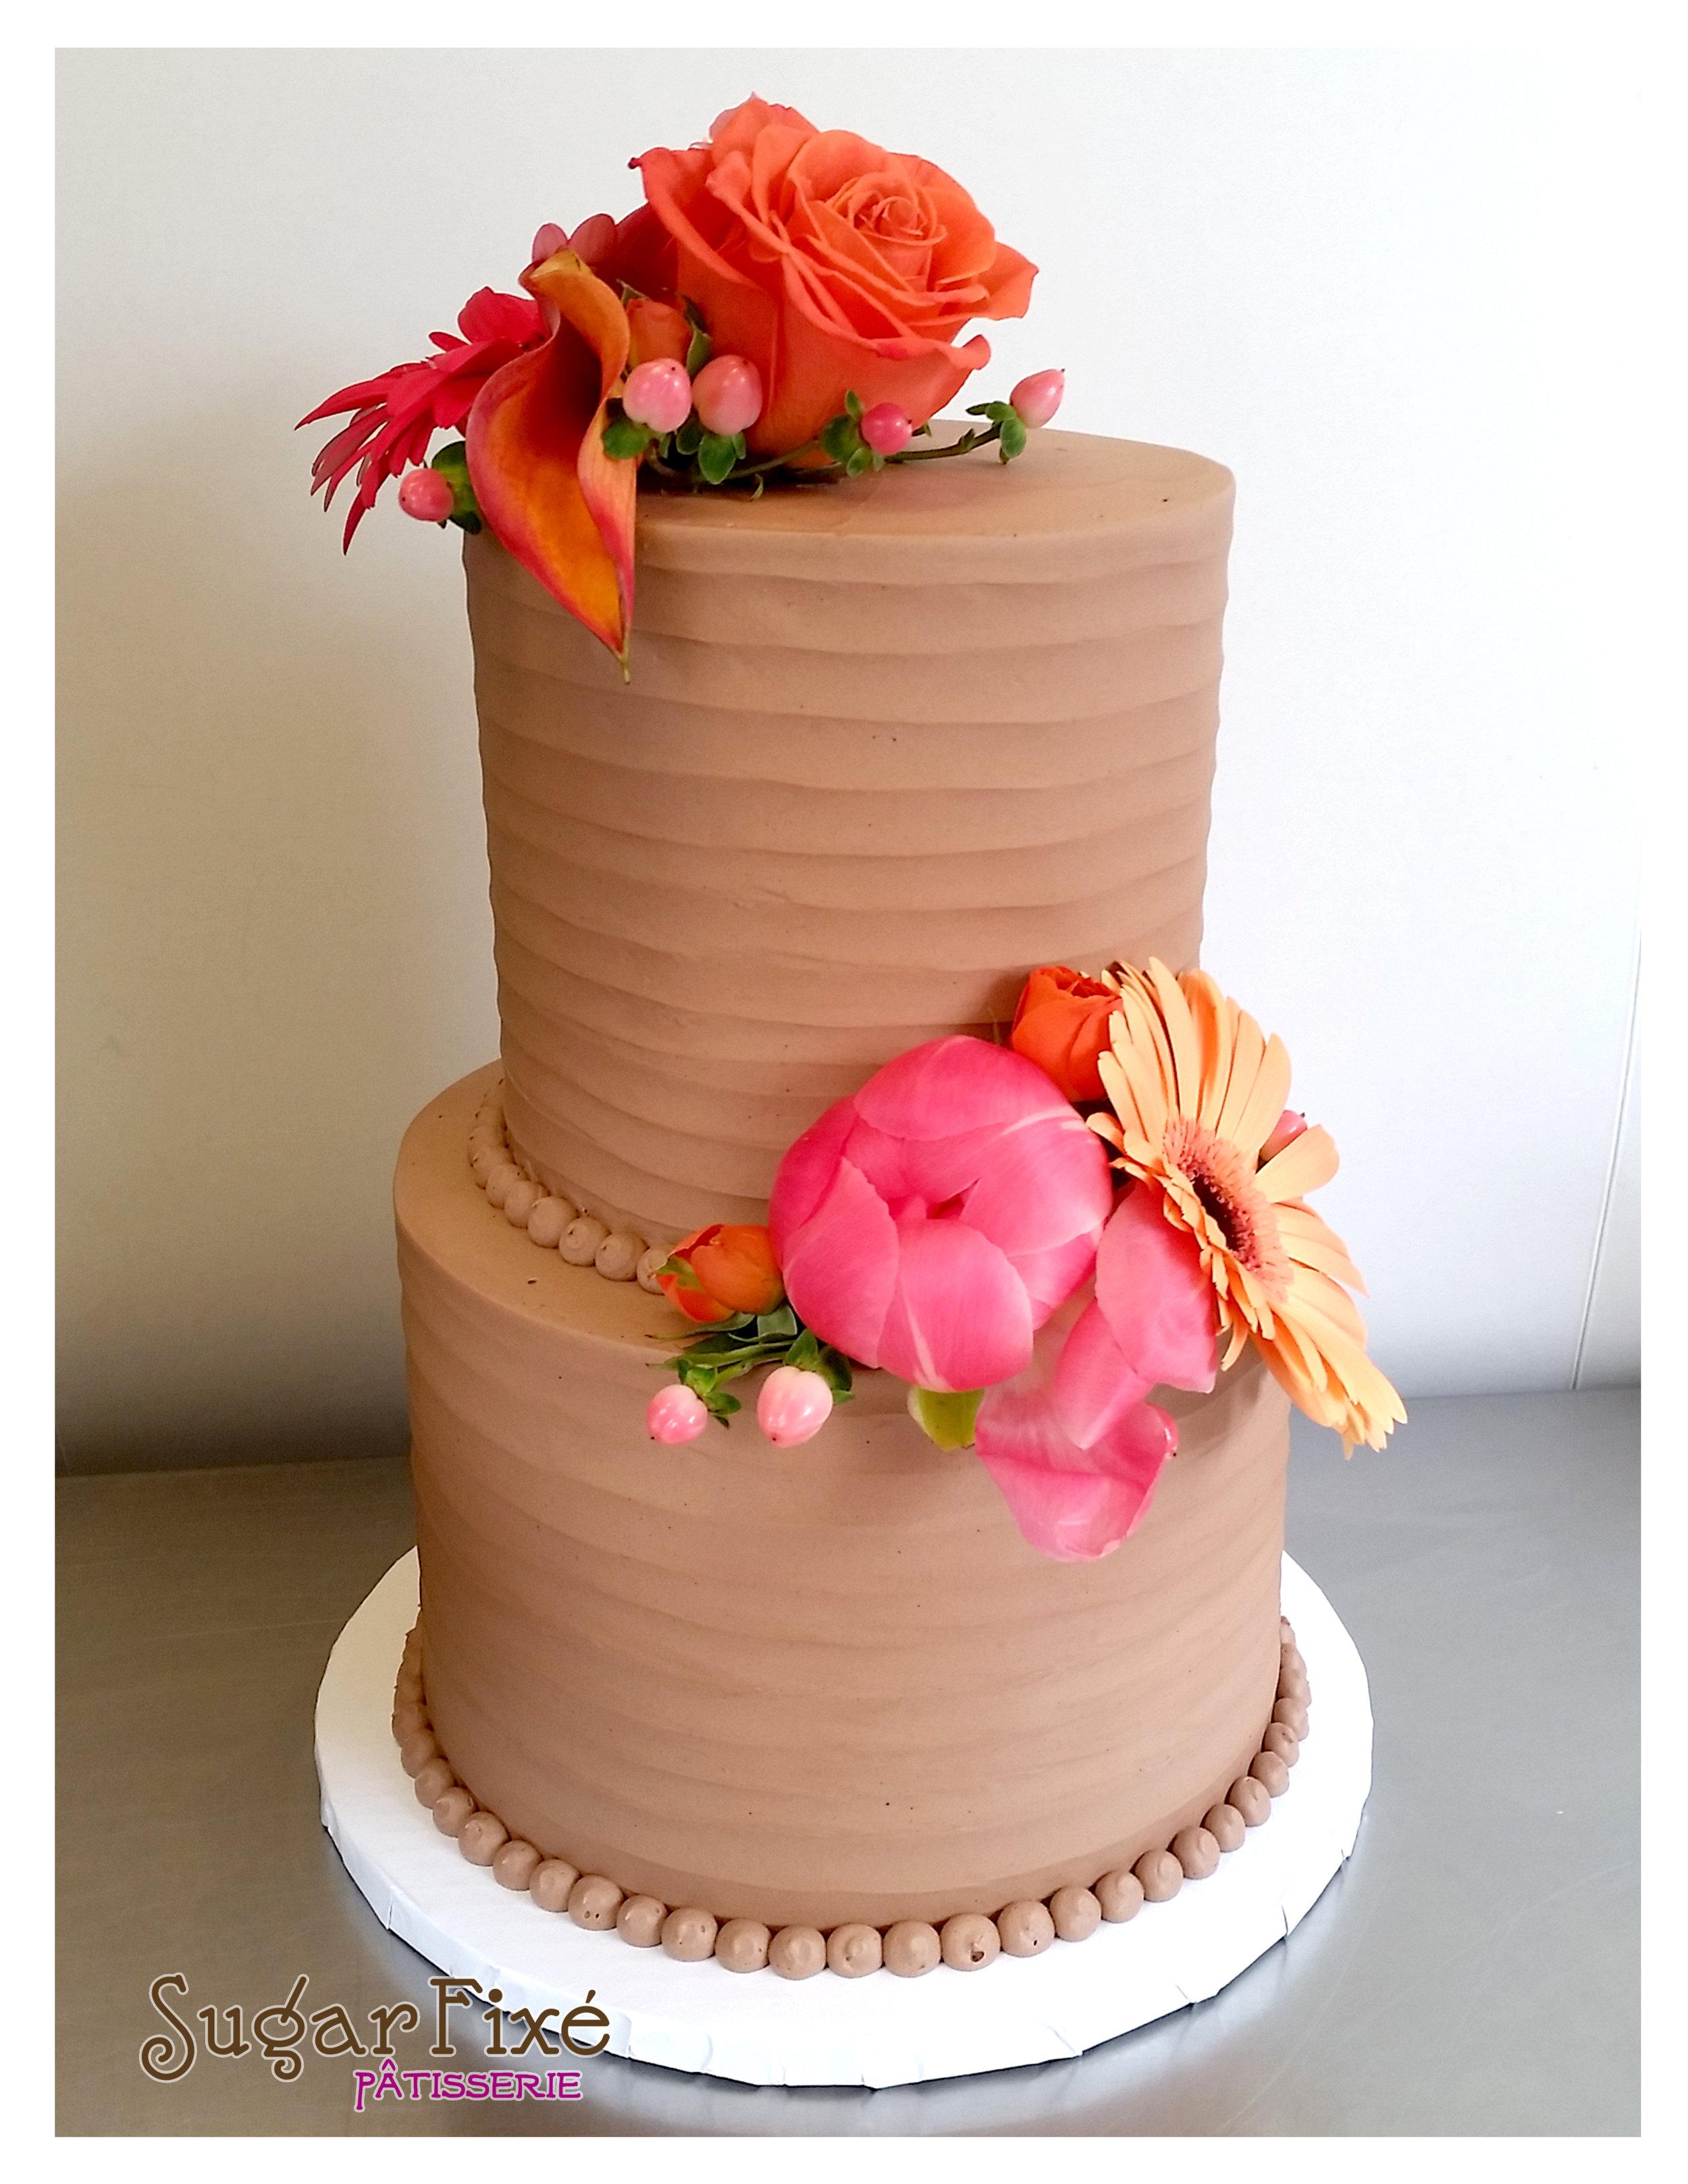 Chocolate Buttercream ripple texture fresh floral cake.jpg